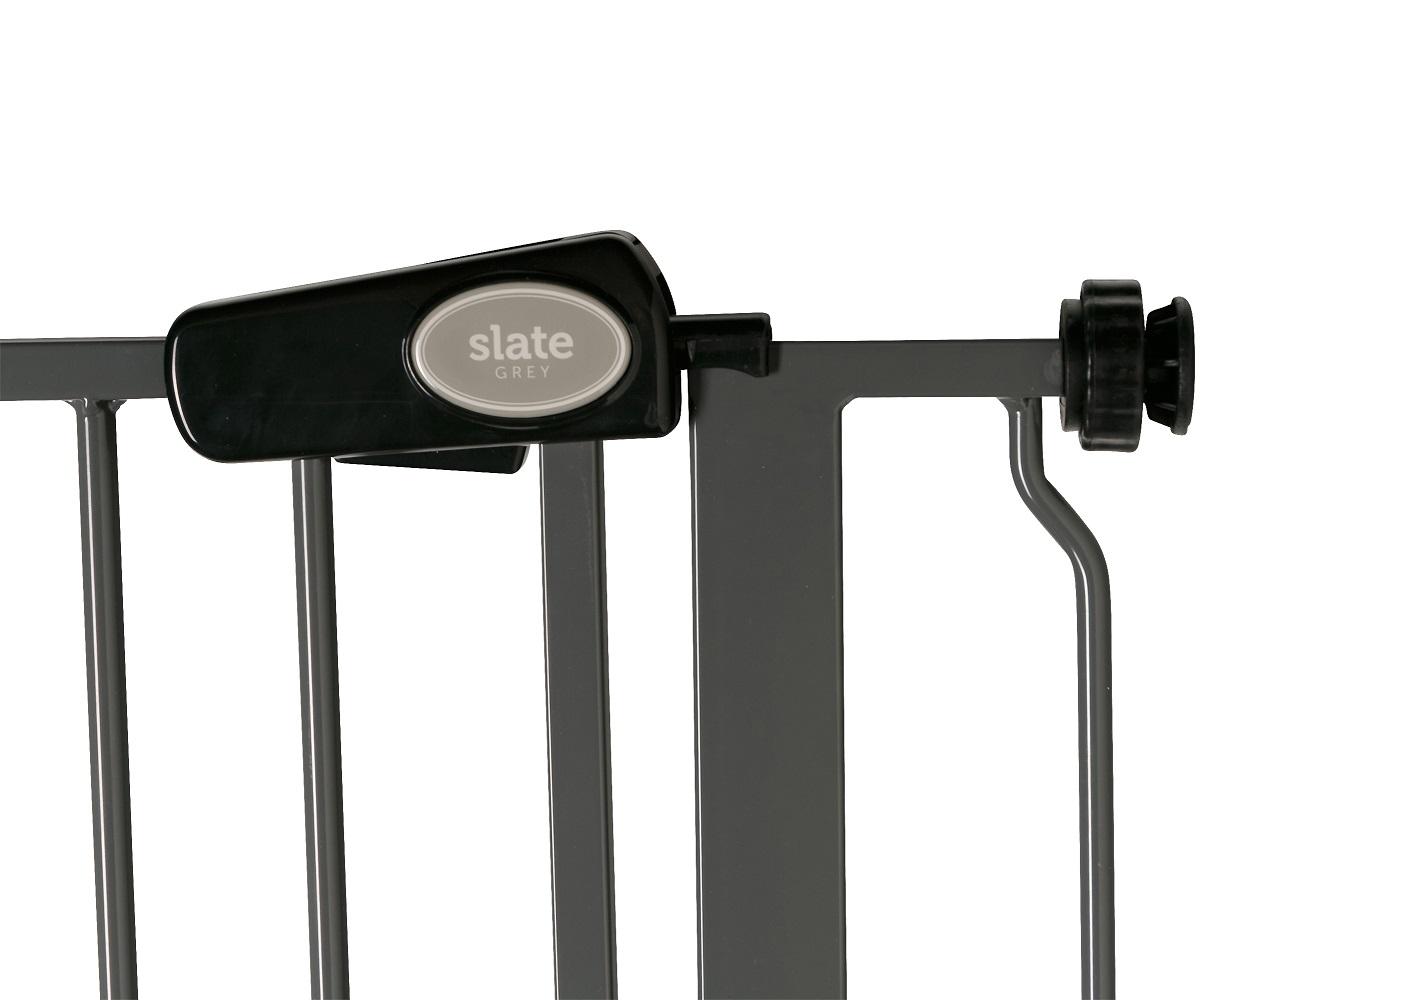 Slate Grey Extra Tall Pressure